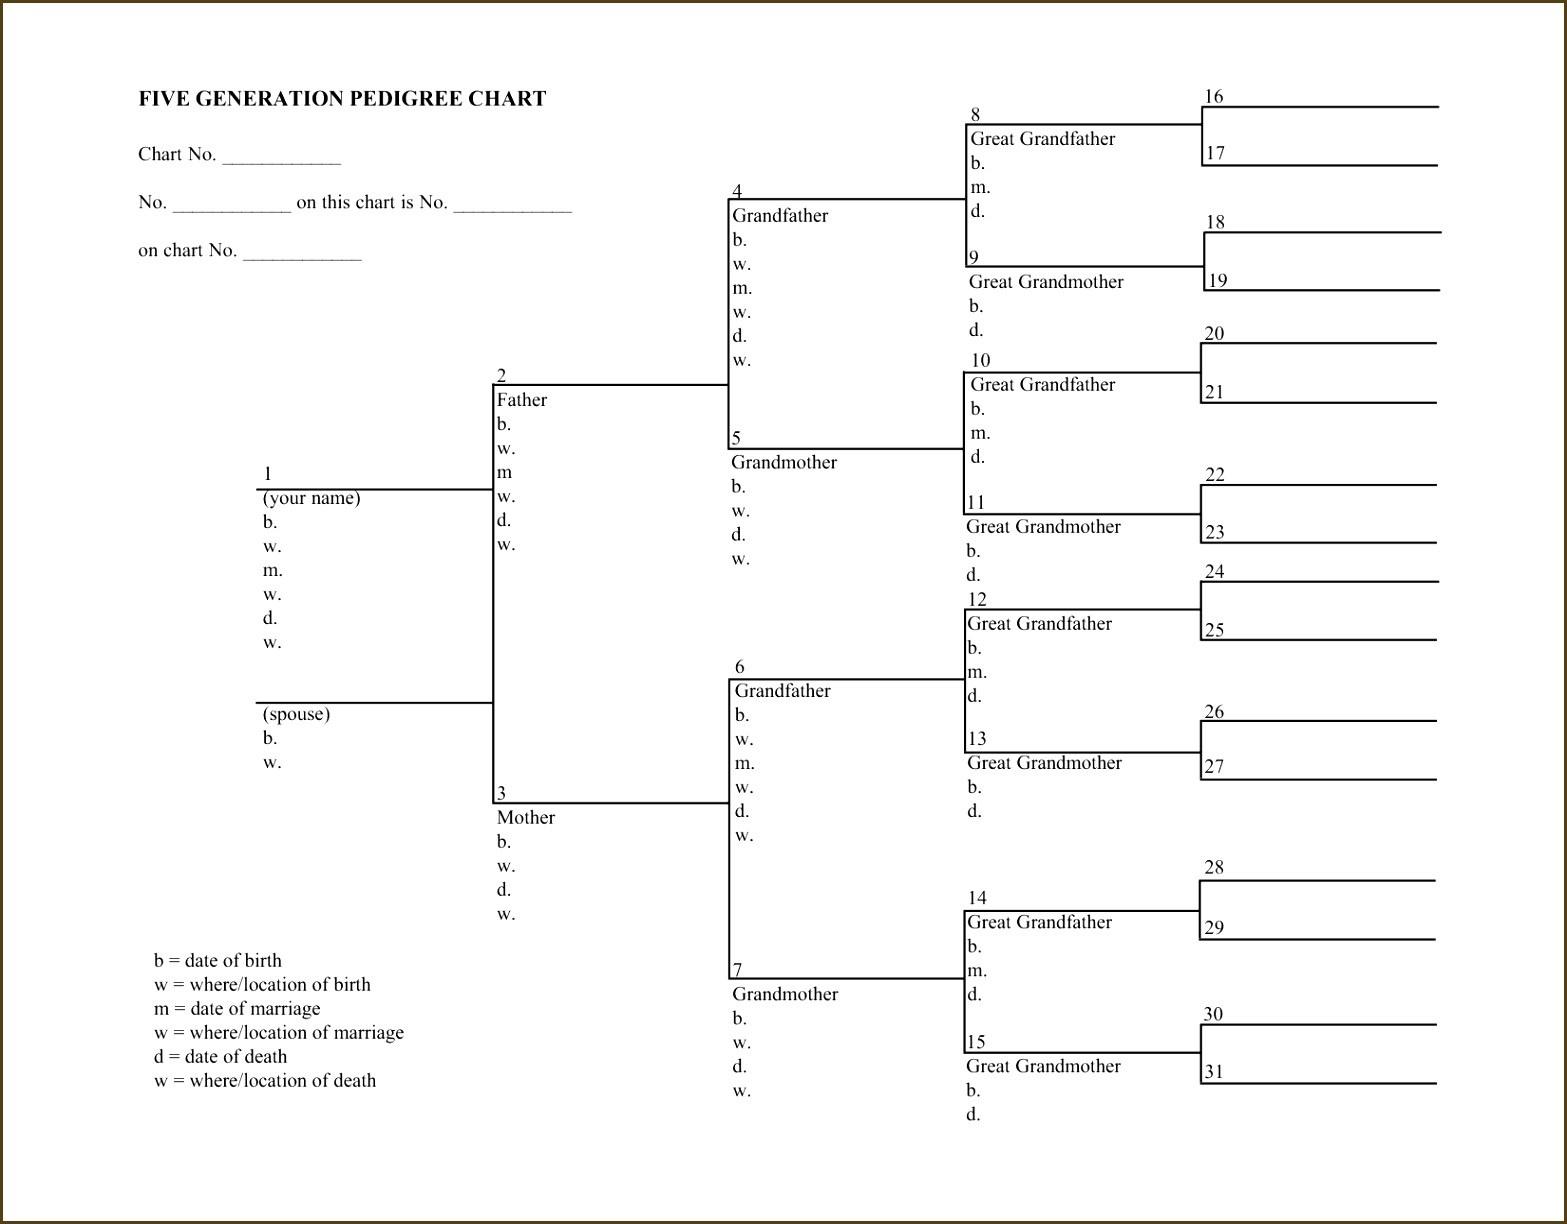 Dog Family Tree Template Online Free Printable Chart Blank Charts To - Free Printable Dog Pedigree Generator